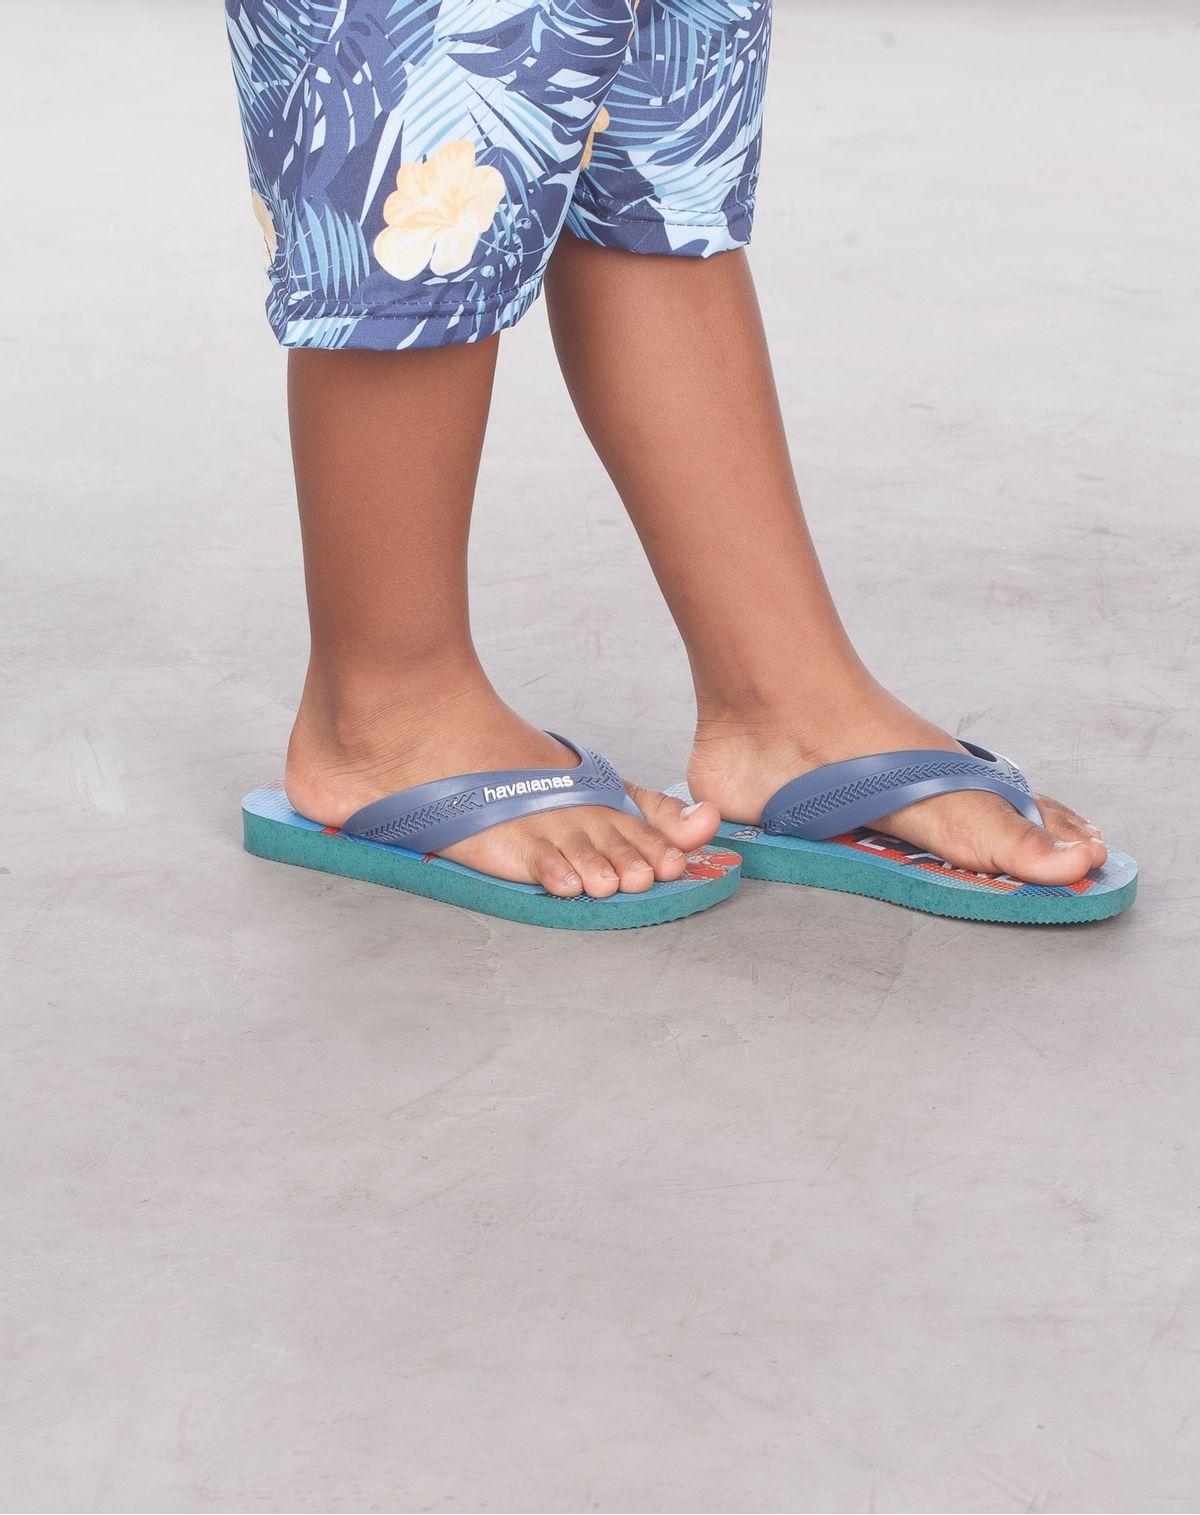 675050376018-Chinelo-Infantil-Menino-Havaianas-Kids-Max-Herois-VERDE-FOLHAGEM-29-0-1